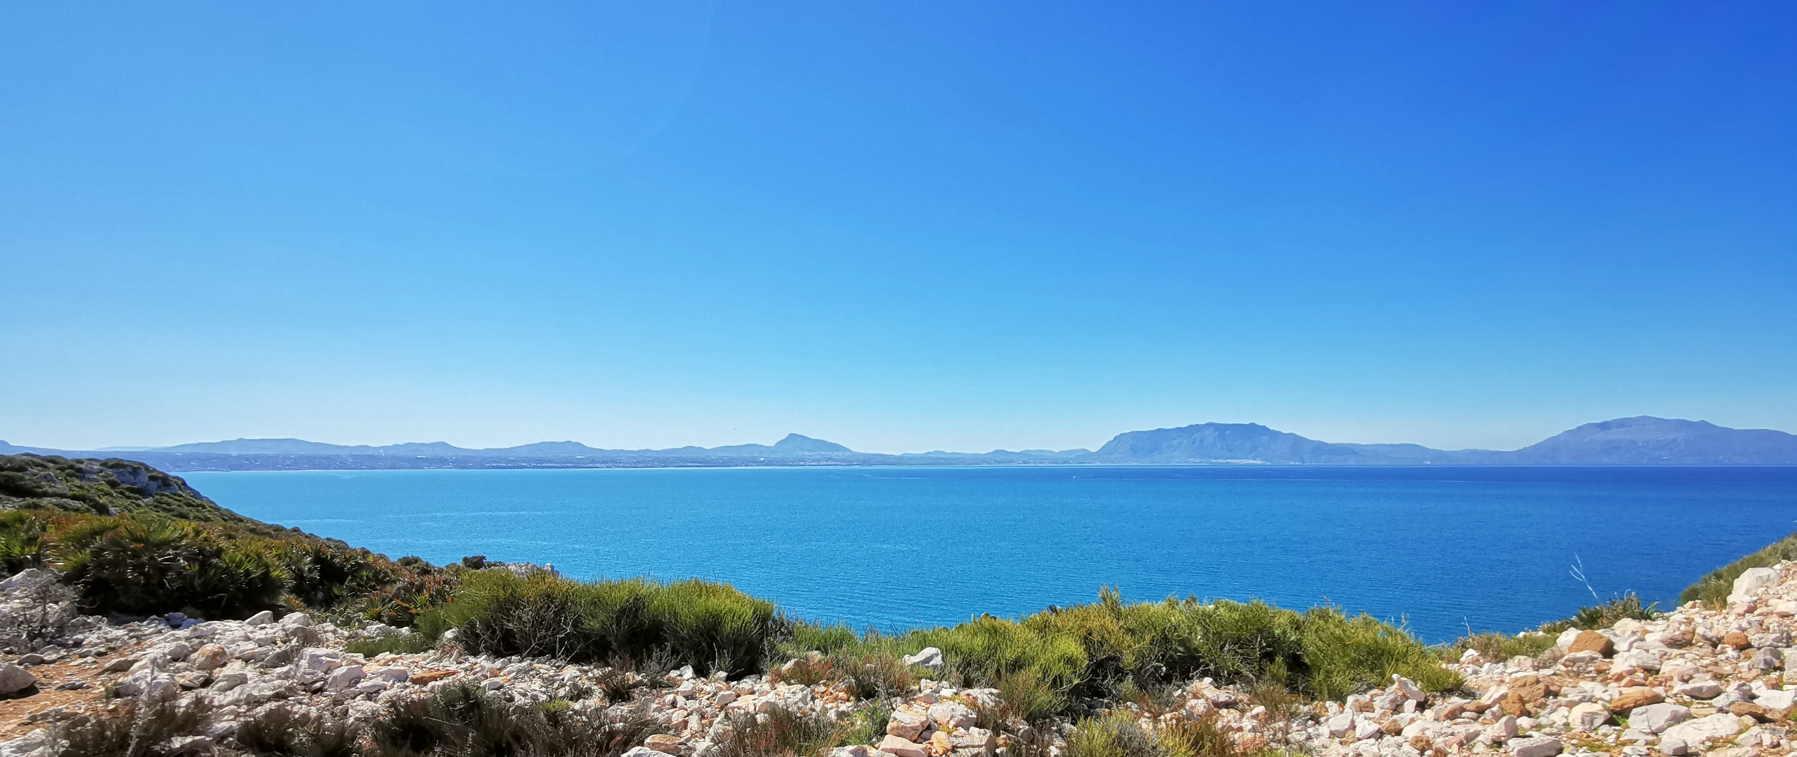 Golfo di Castellammare